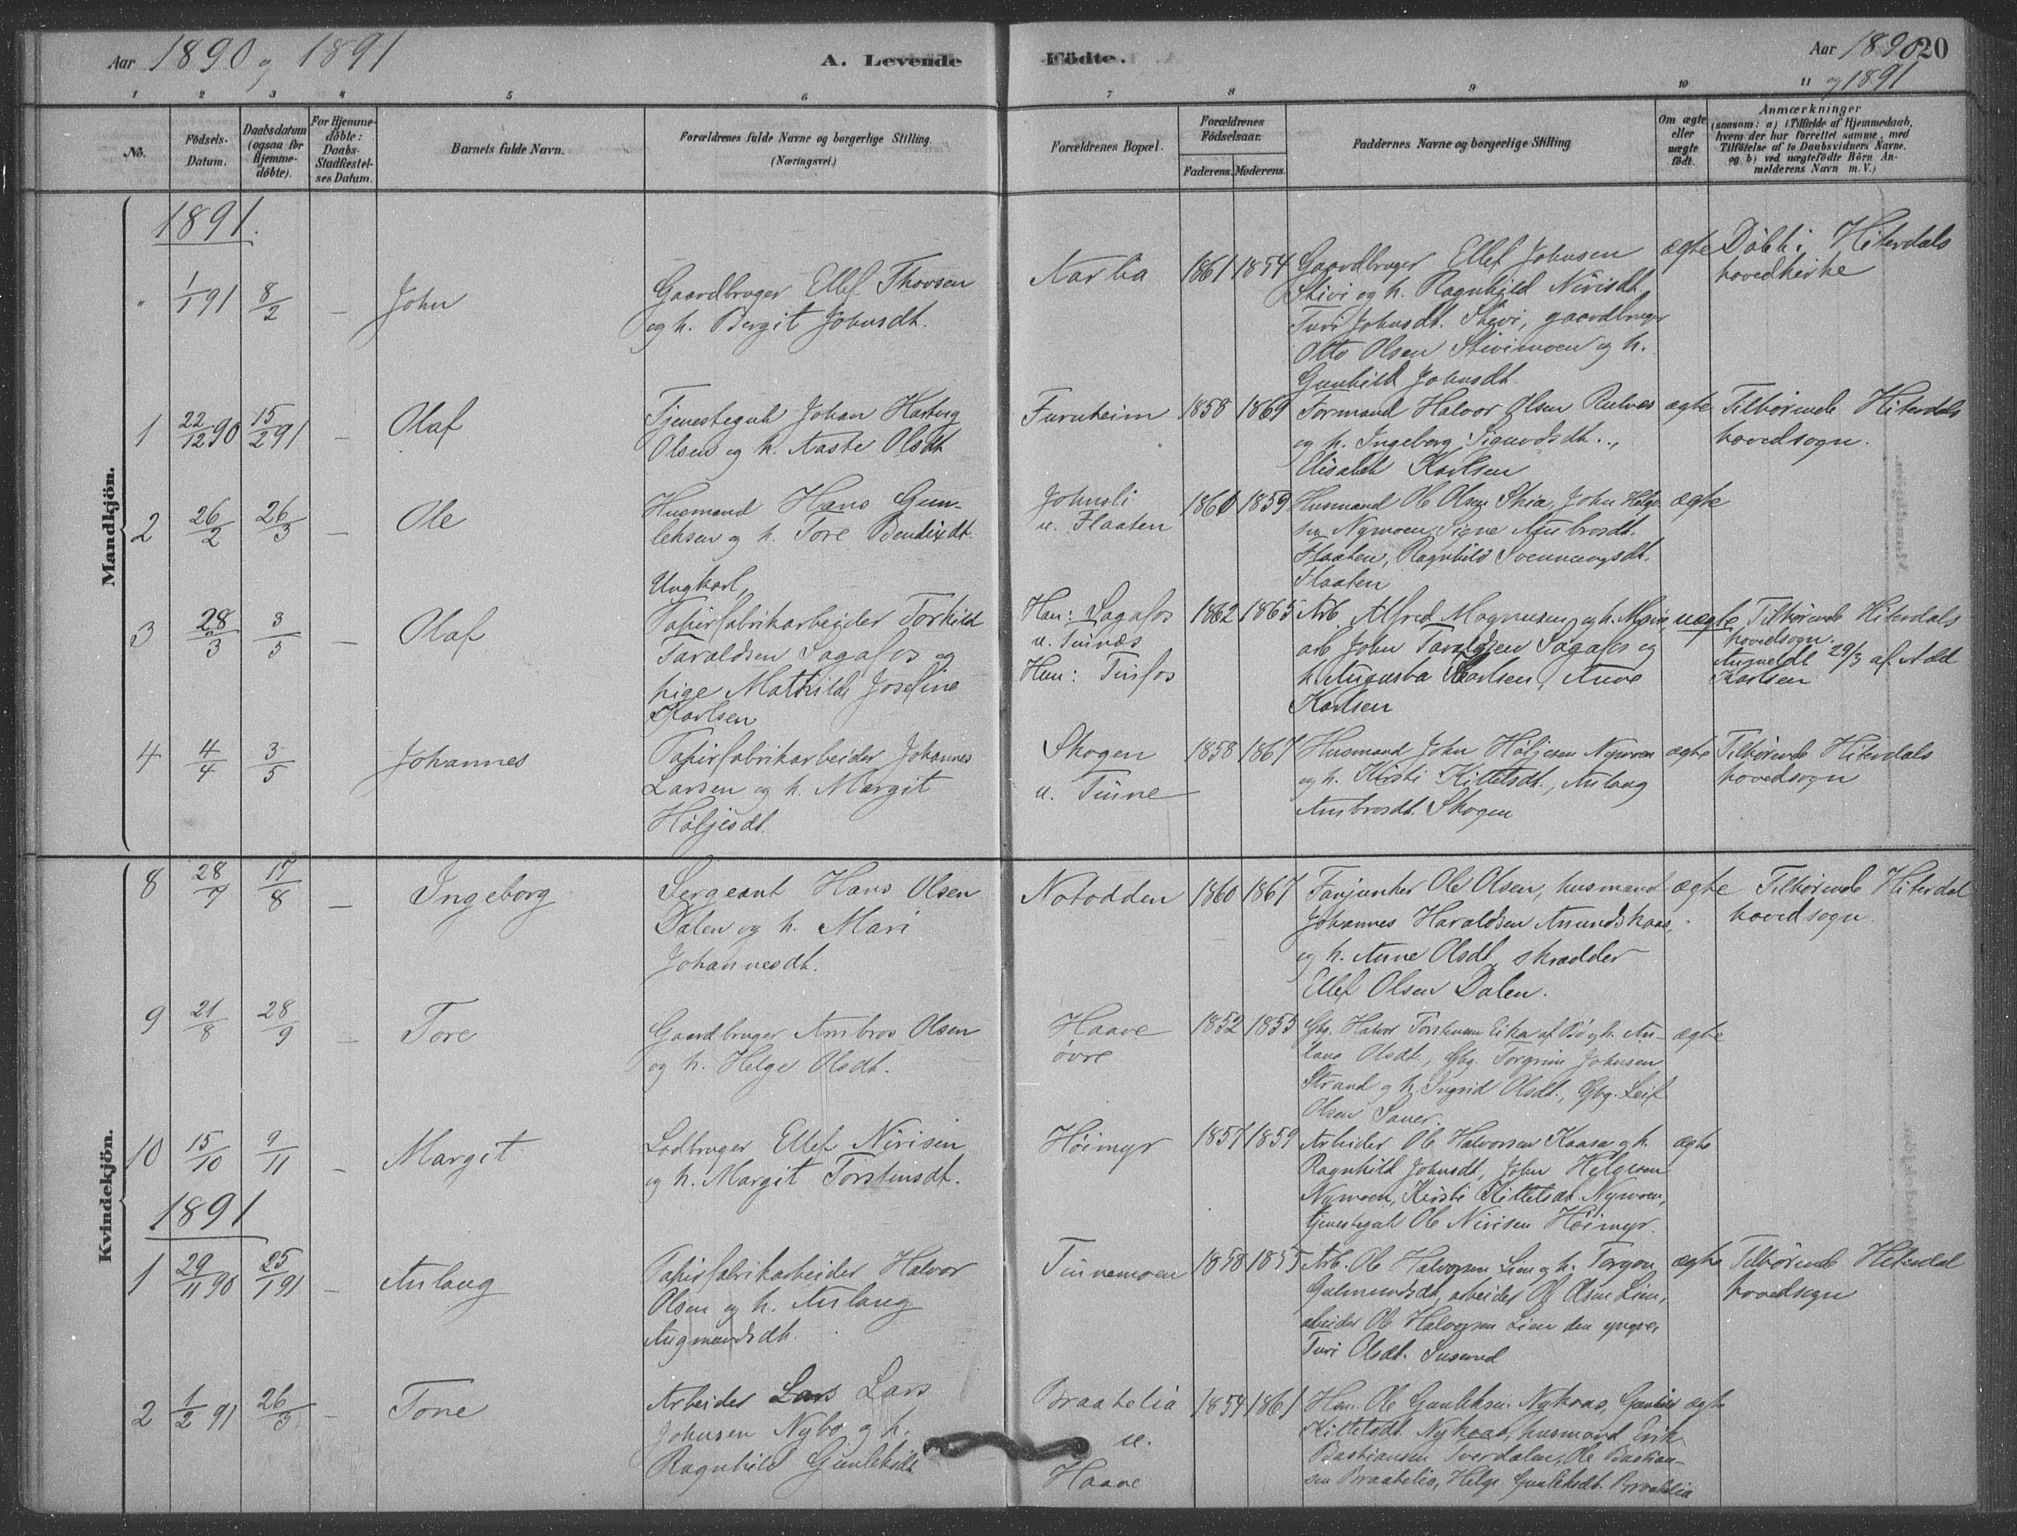 SAKO, Heddal kirkebøker, F/Fb/L0002: Ministerialbok nr. II 2, 1878-1913, s. 20